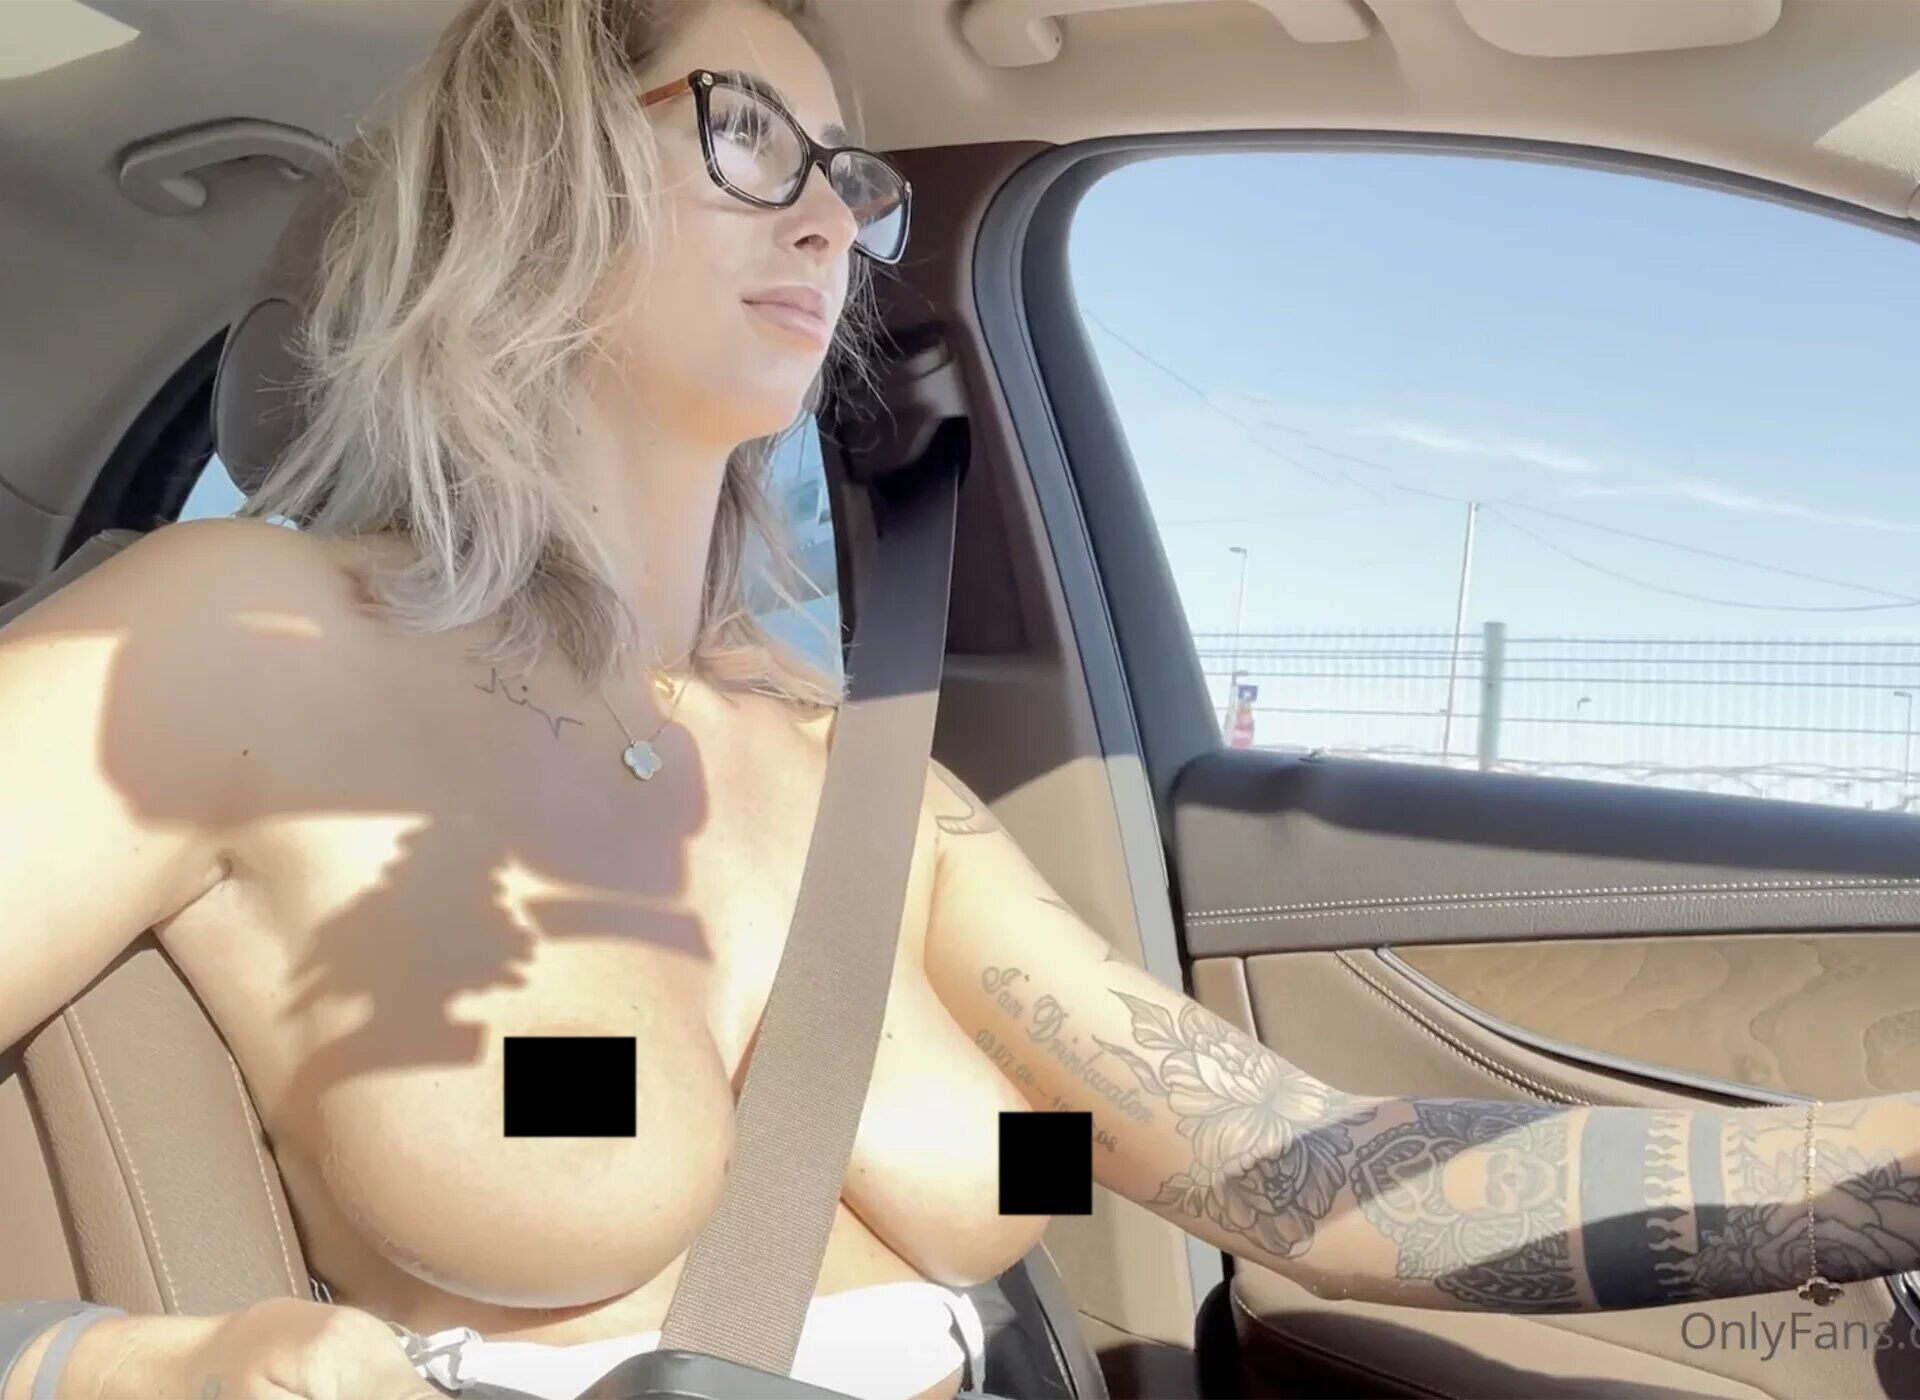 Николь Дринквотер голая за рулем